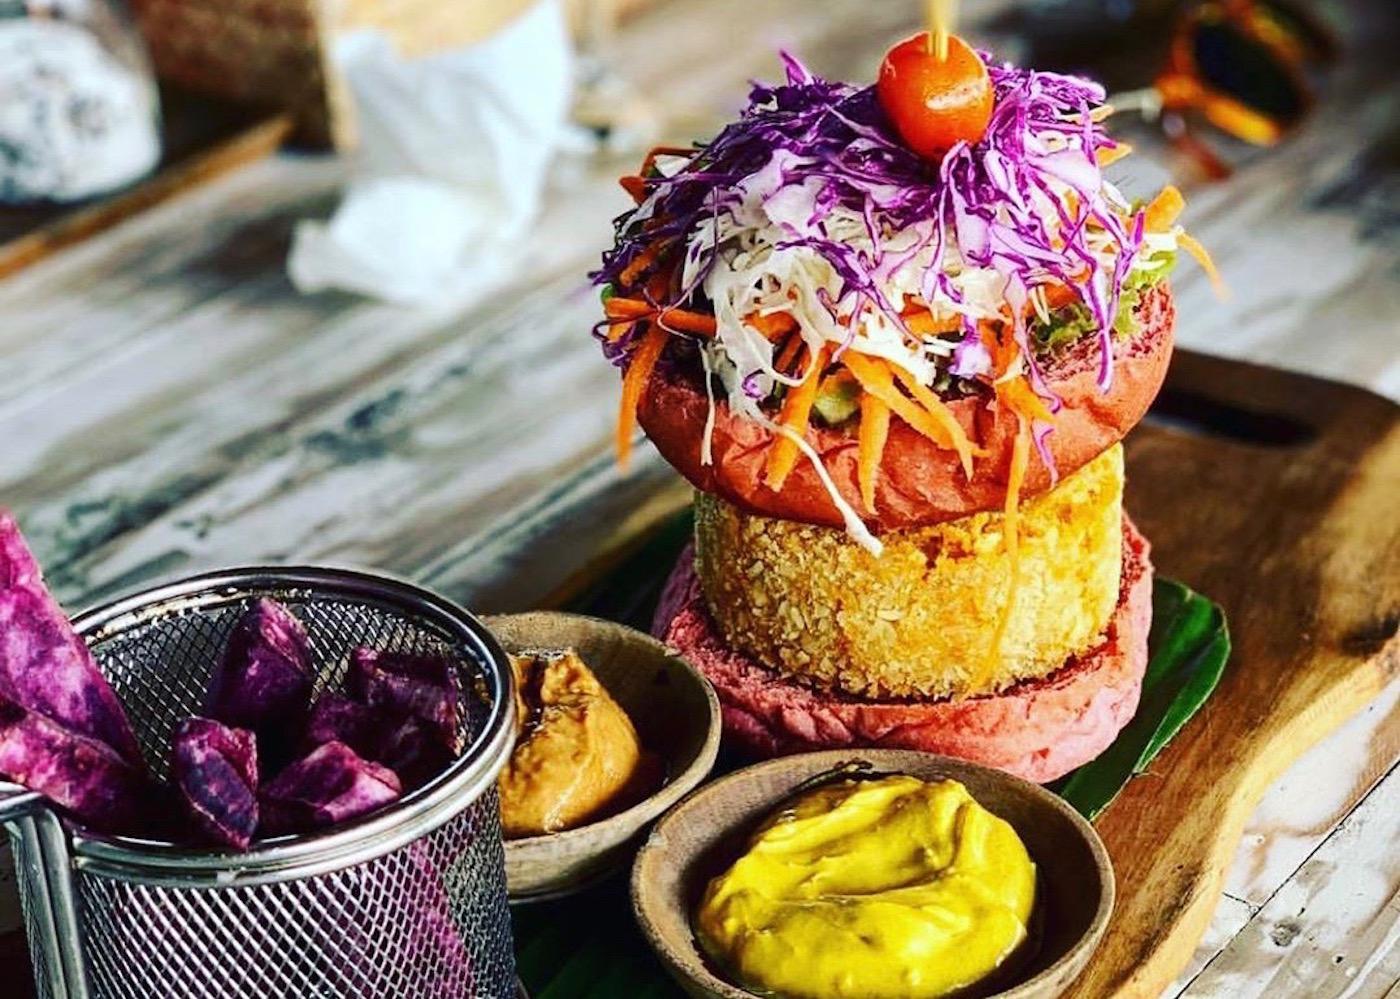 Healthy vegetarian burger at Omburger restaurant in Uluwatu, Bali, Indonesia